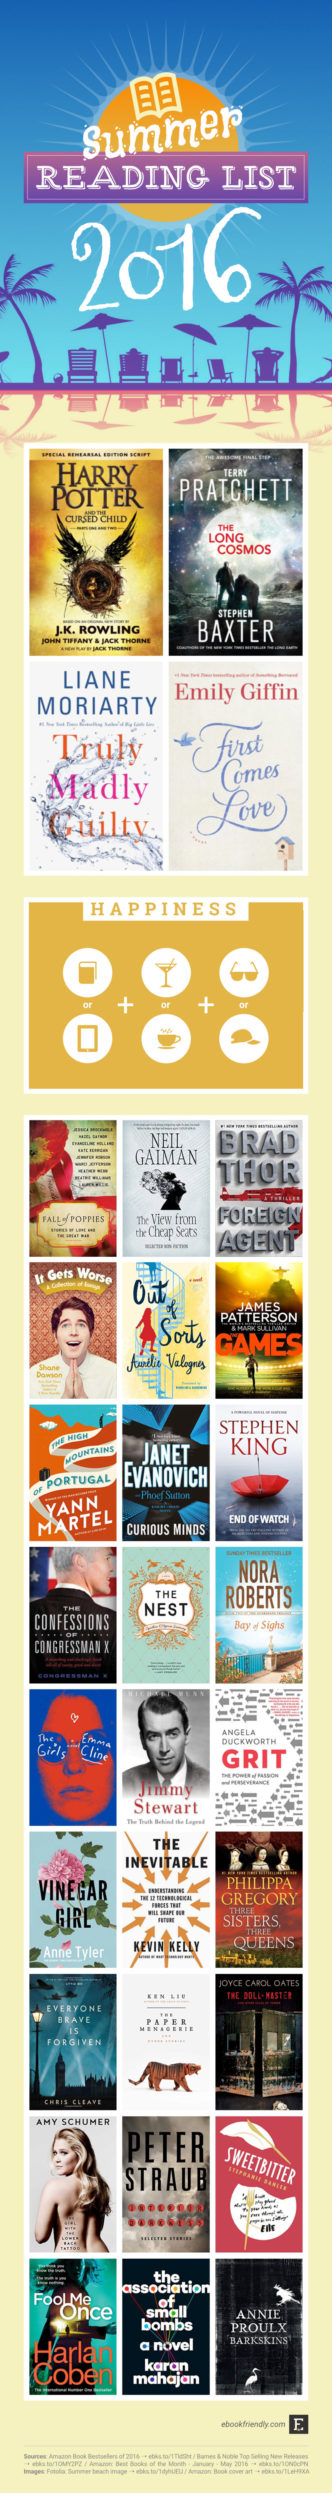 Summer reading list 2016 #infographic